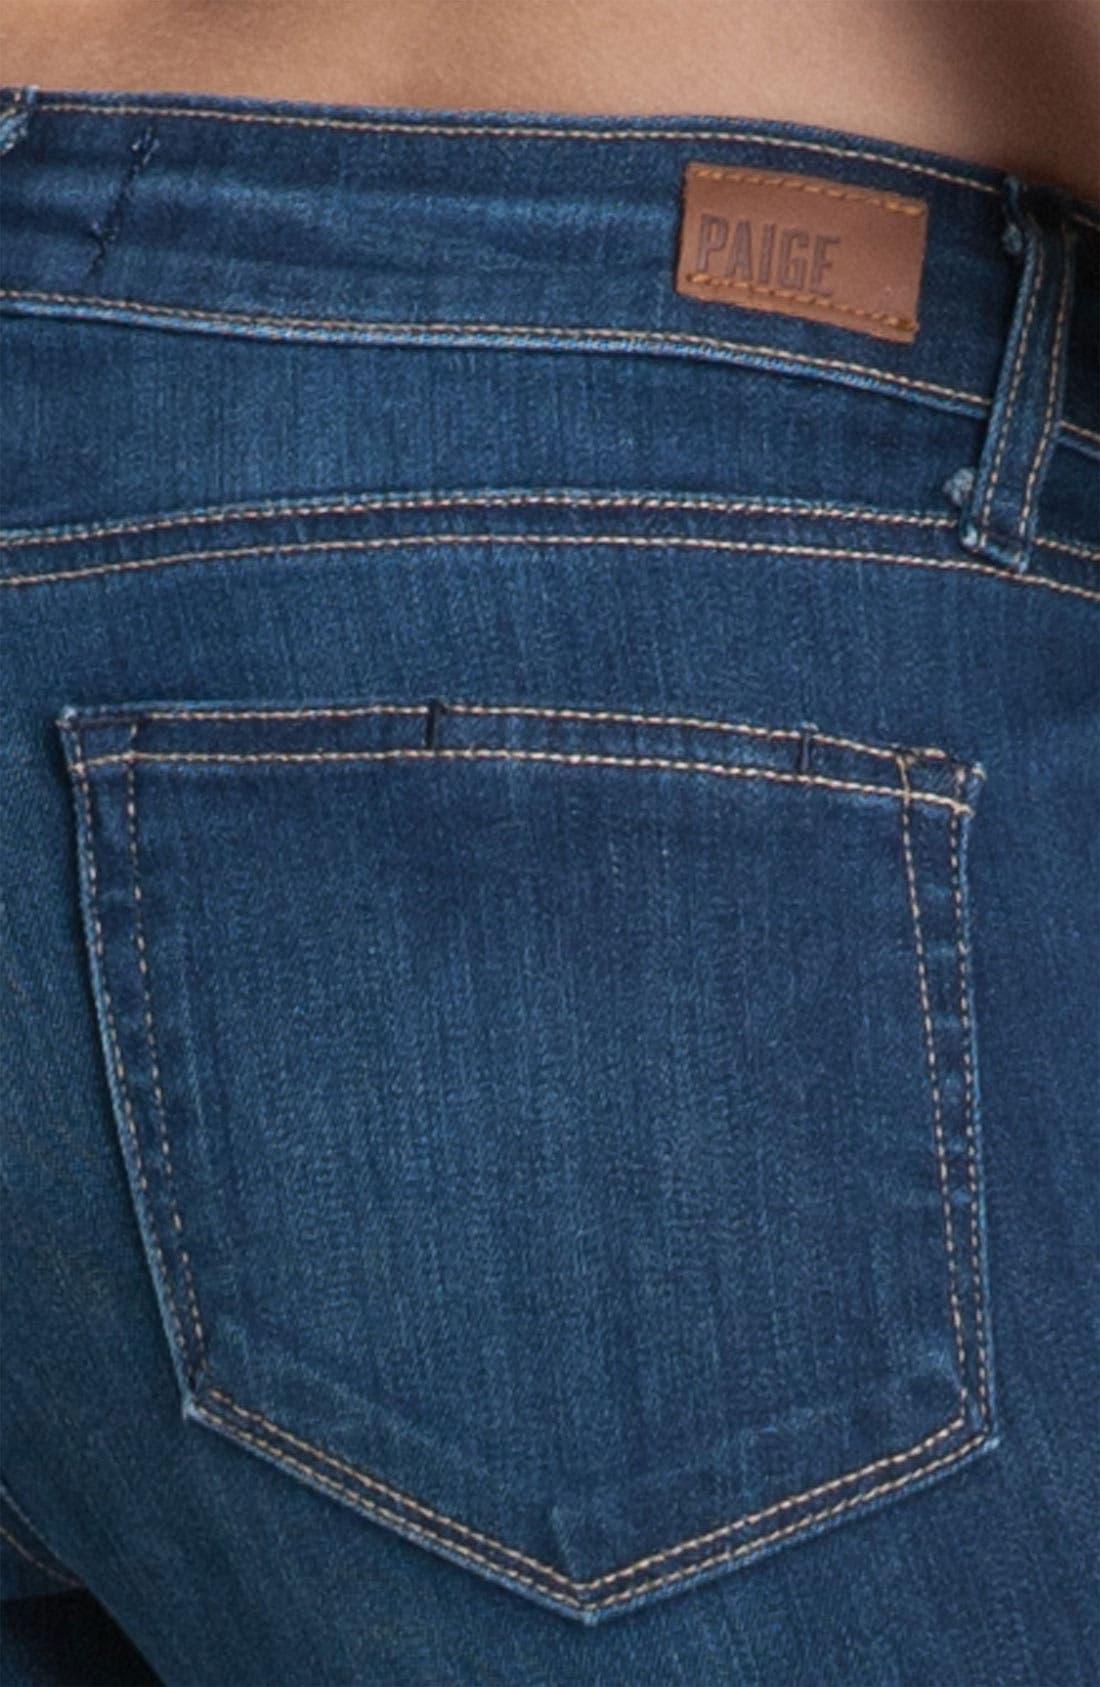 Alternate Image 3  - Paige Denim 'Skyline' Skinny Jeans (Ravine)